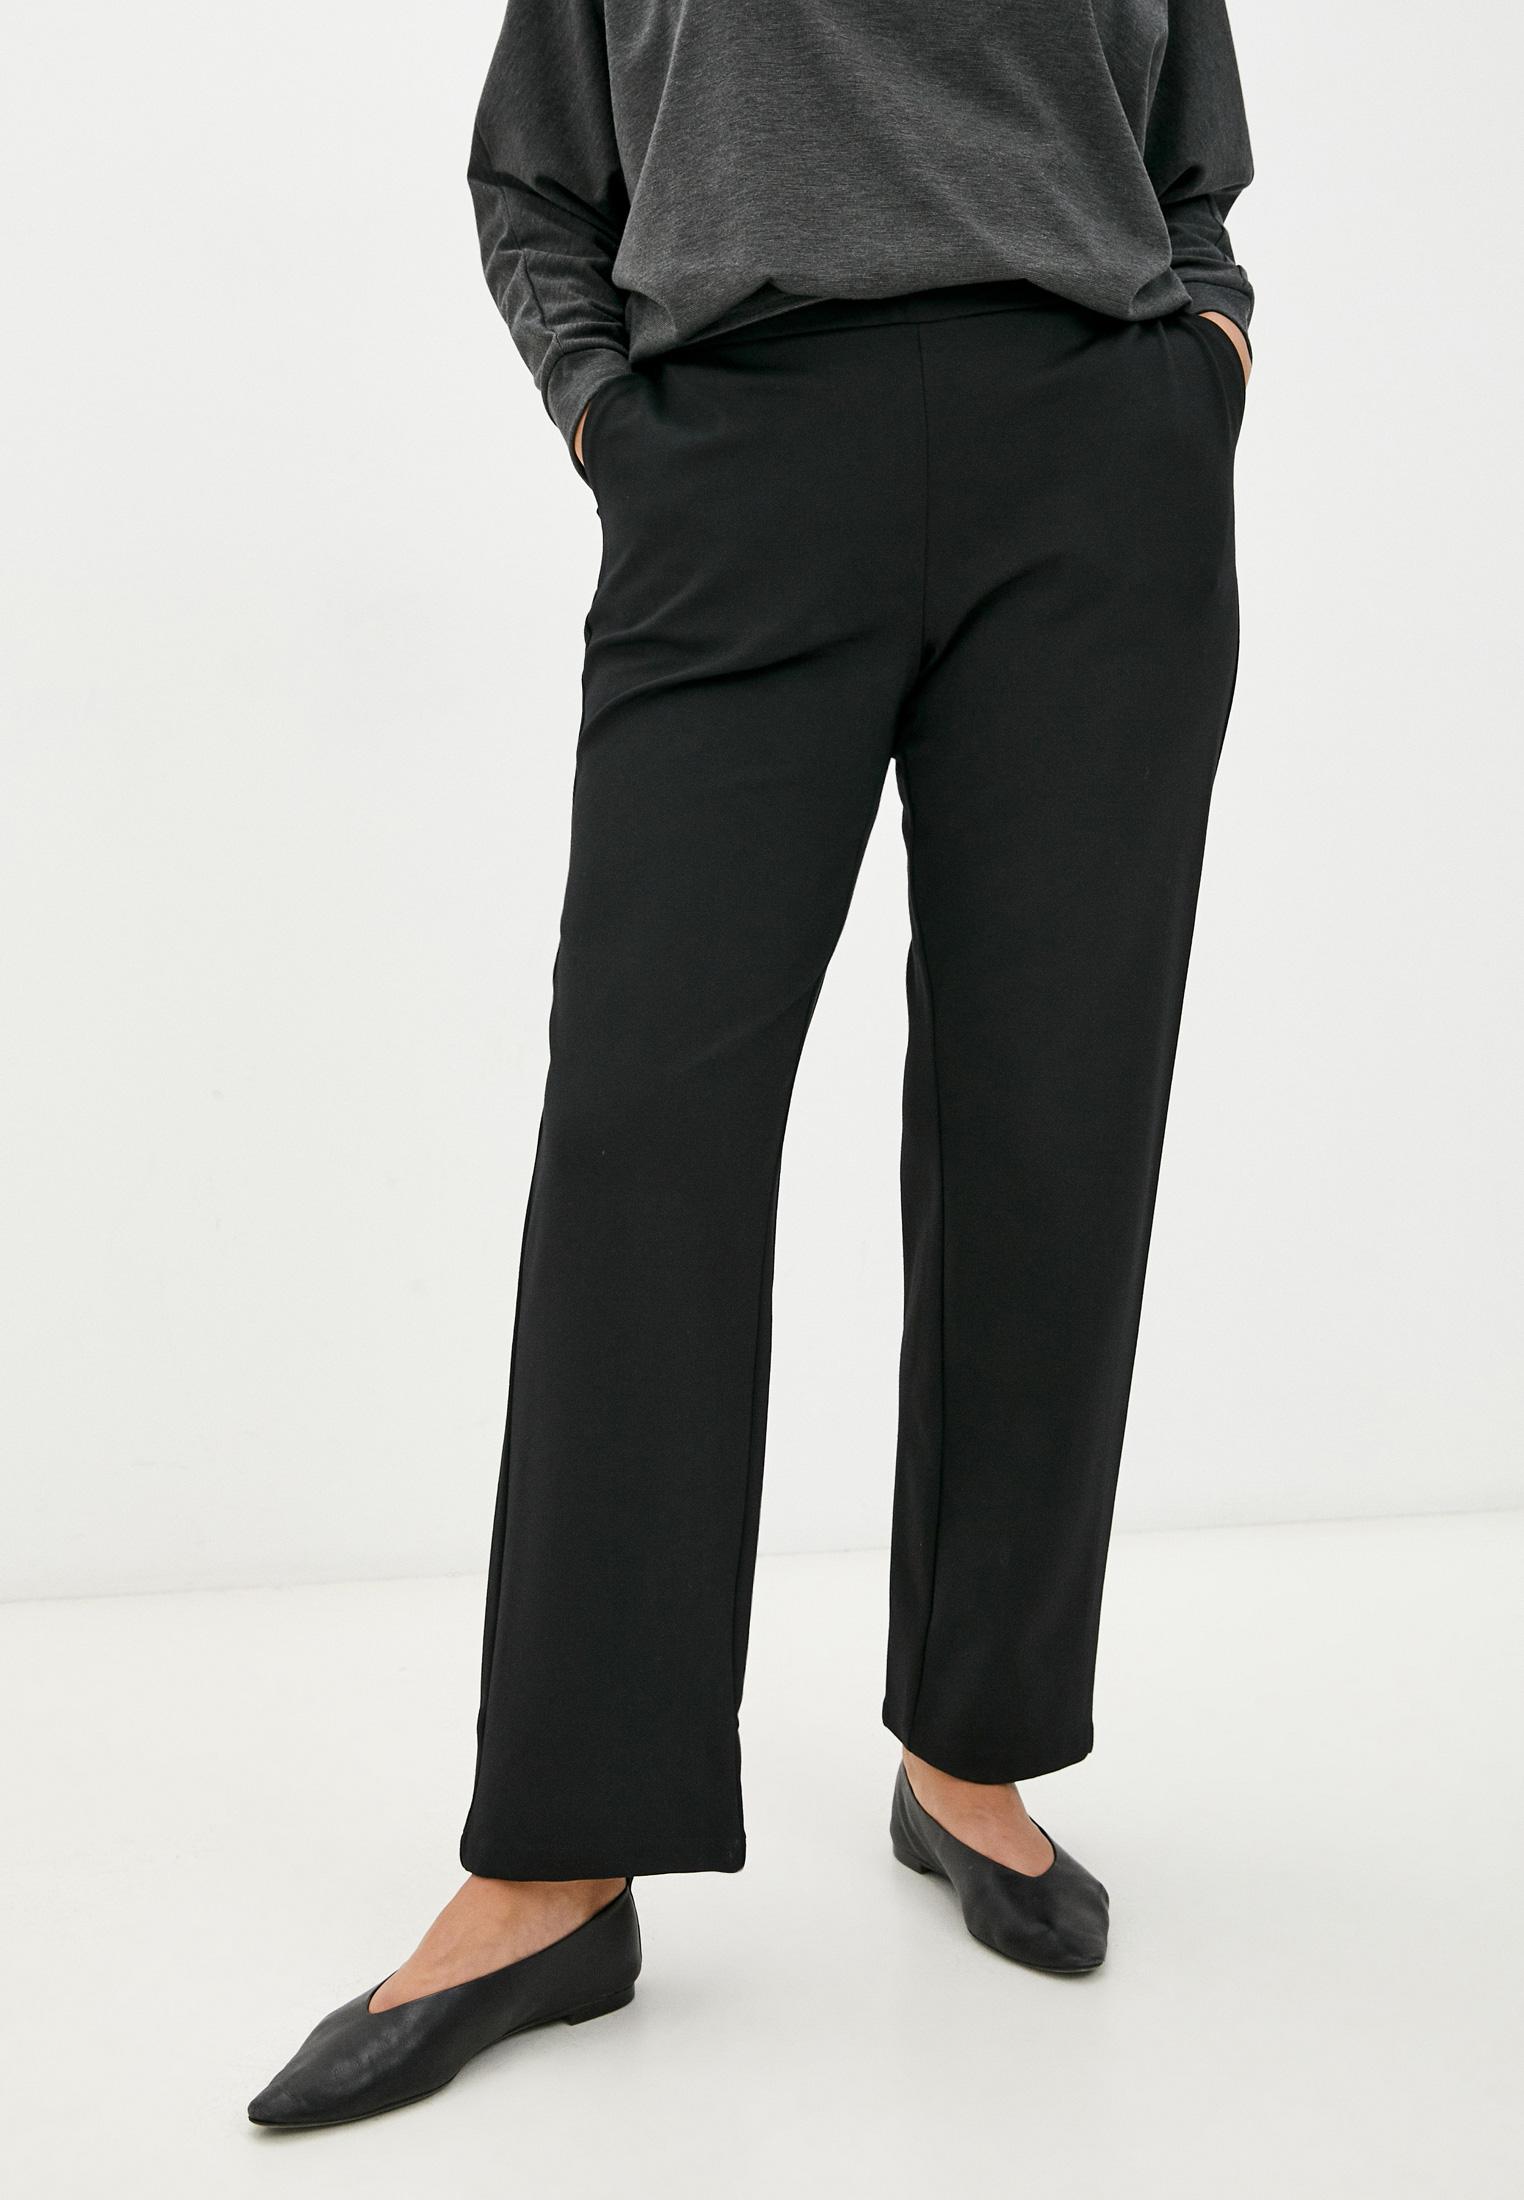 Женские прямые брюки Zizzi Брюки Zizzi